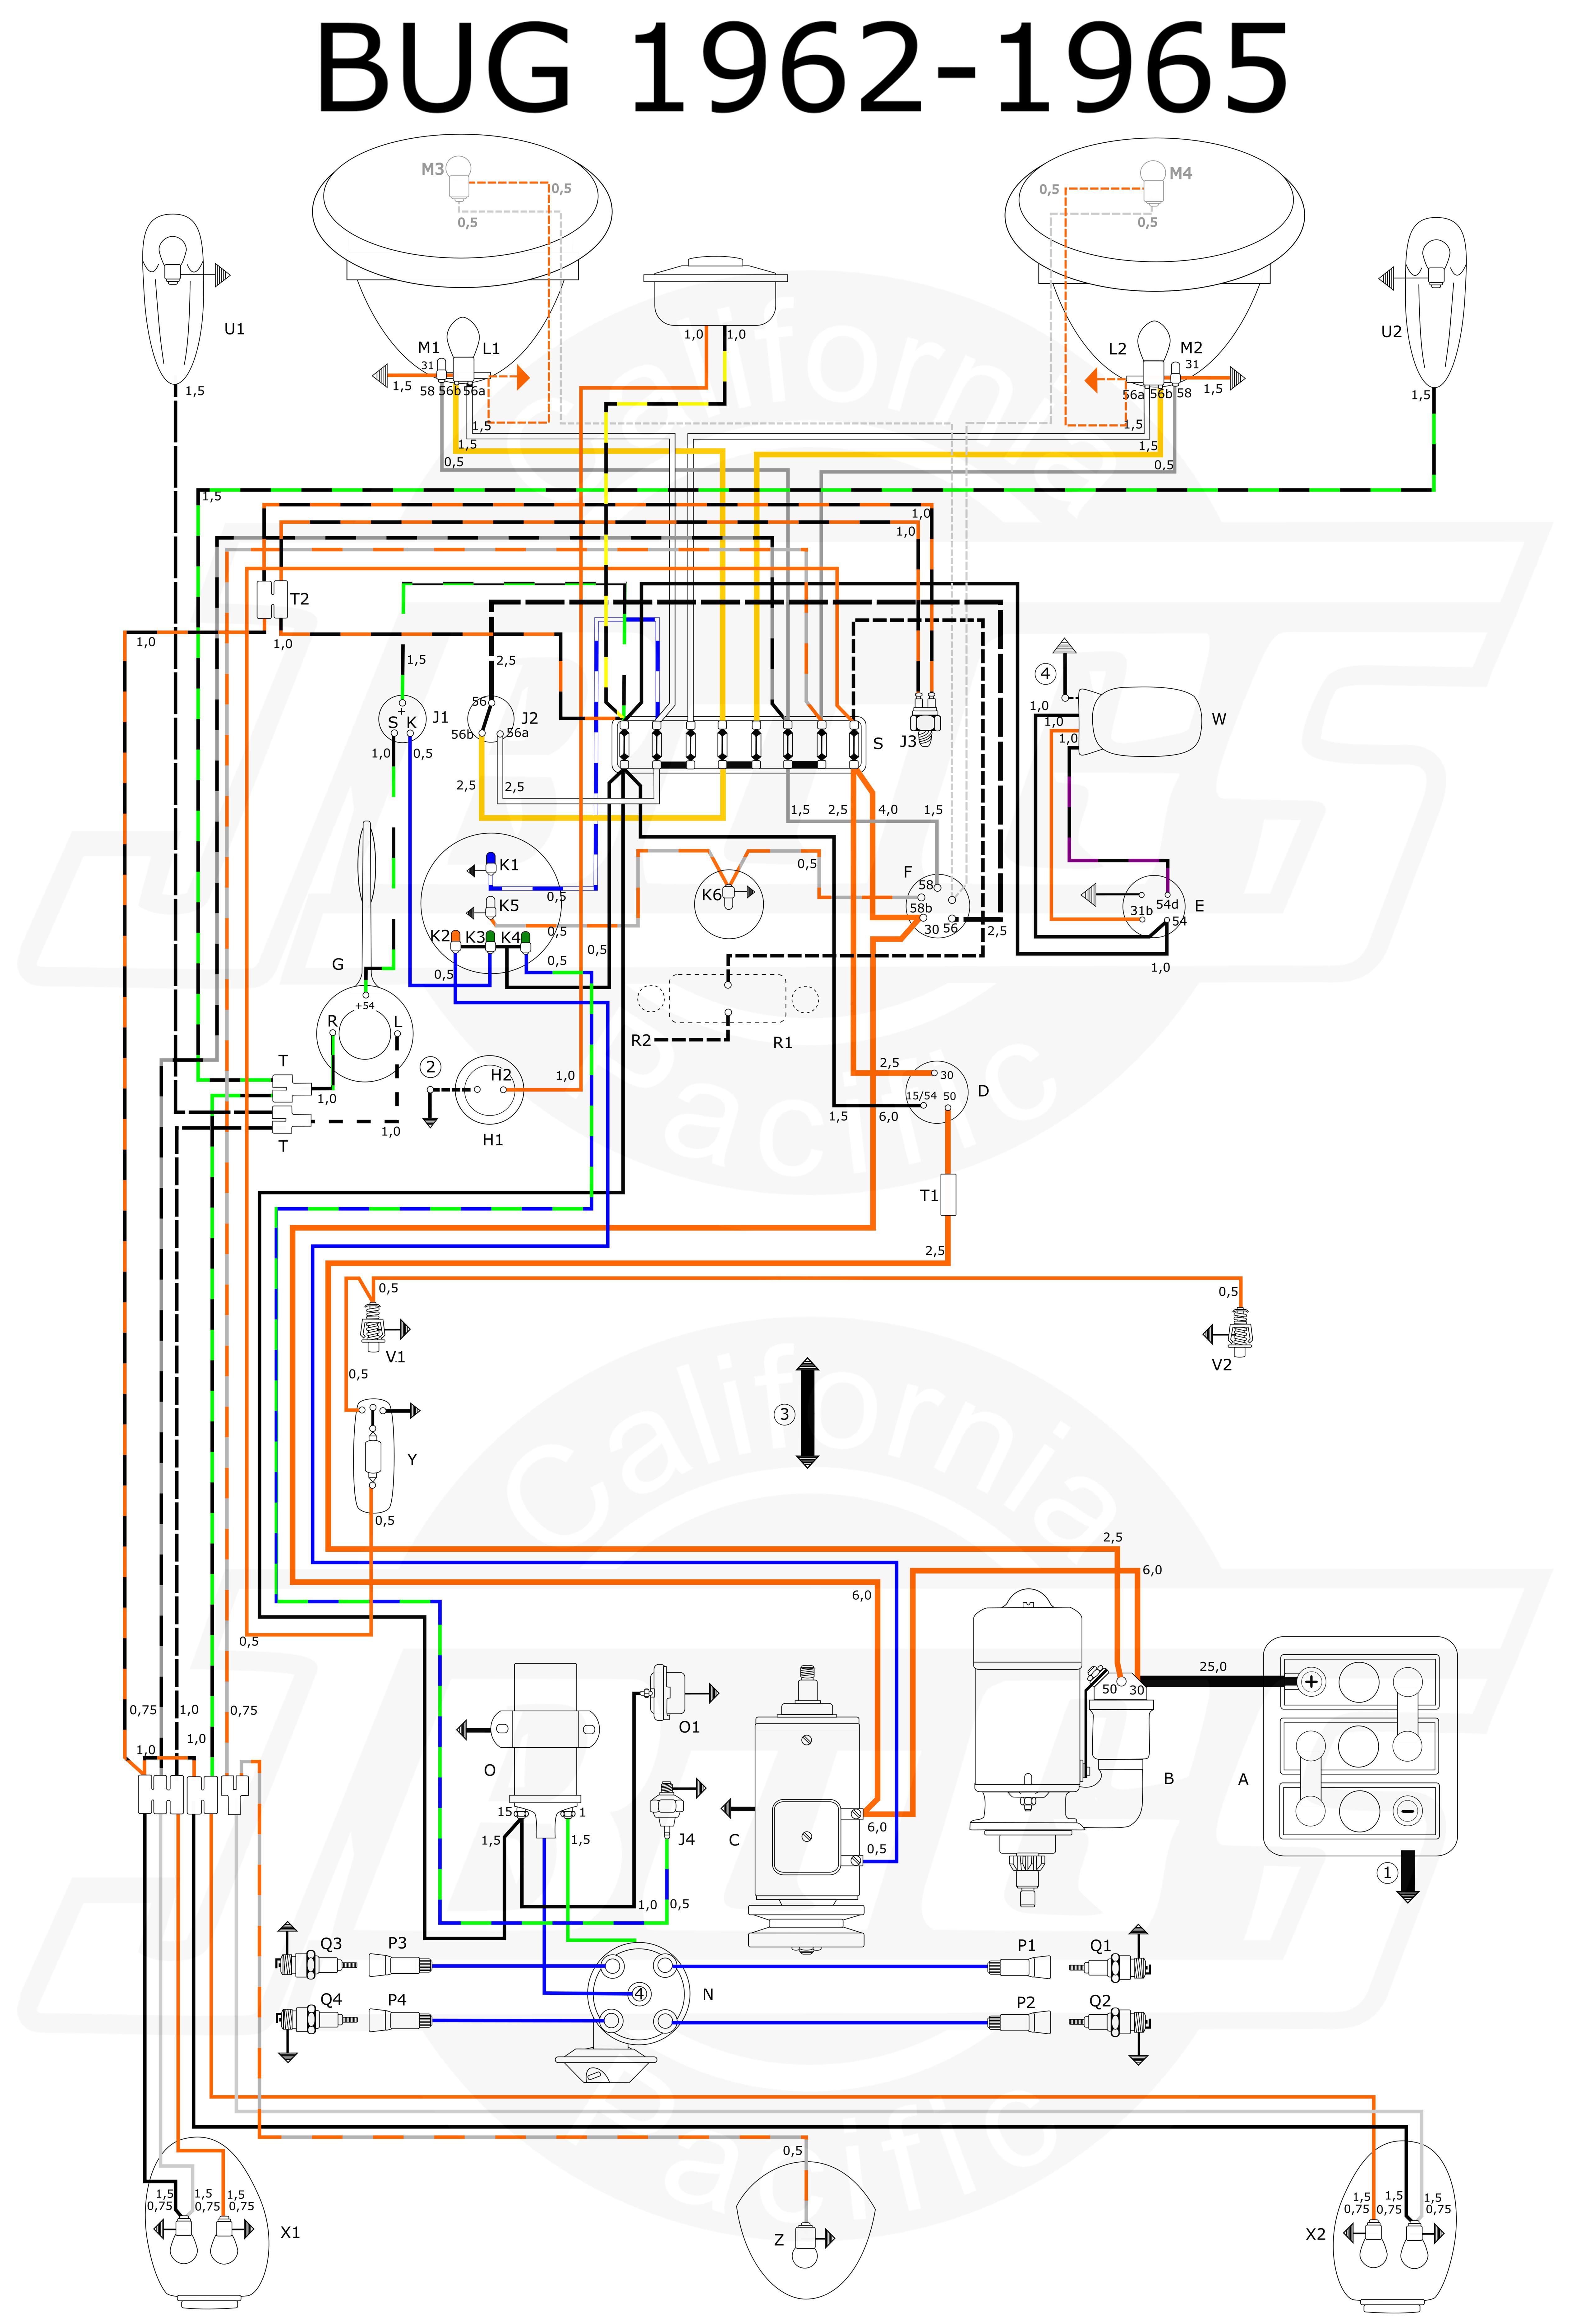 1963 volkswagen headlight wiring diagram wiring library 74 vw wiring a motor 1963 vw beetle wiring harness auto electrical wiring diagram vw beetle diagram 1963 vw beetle wiring